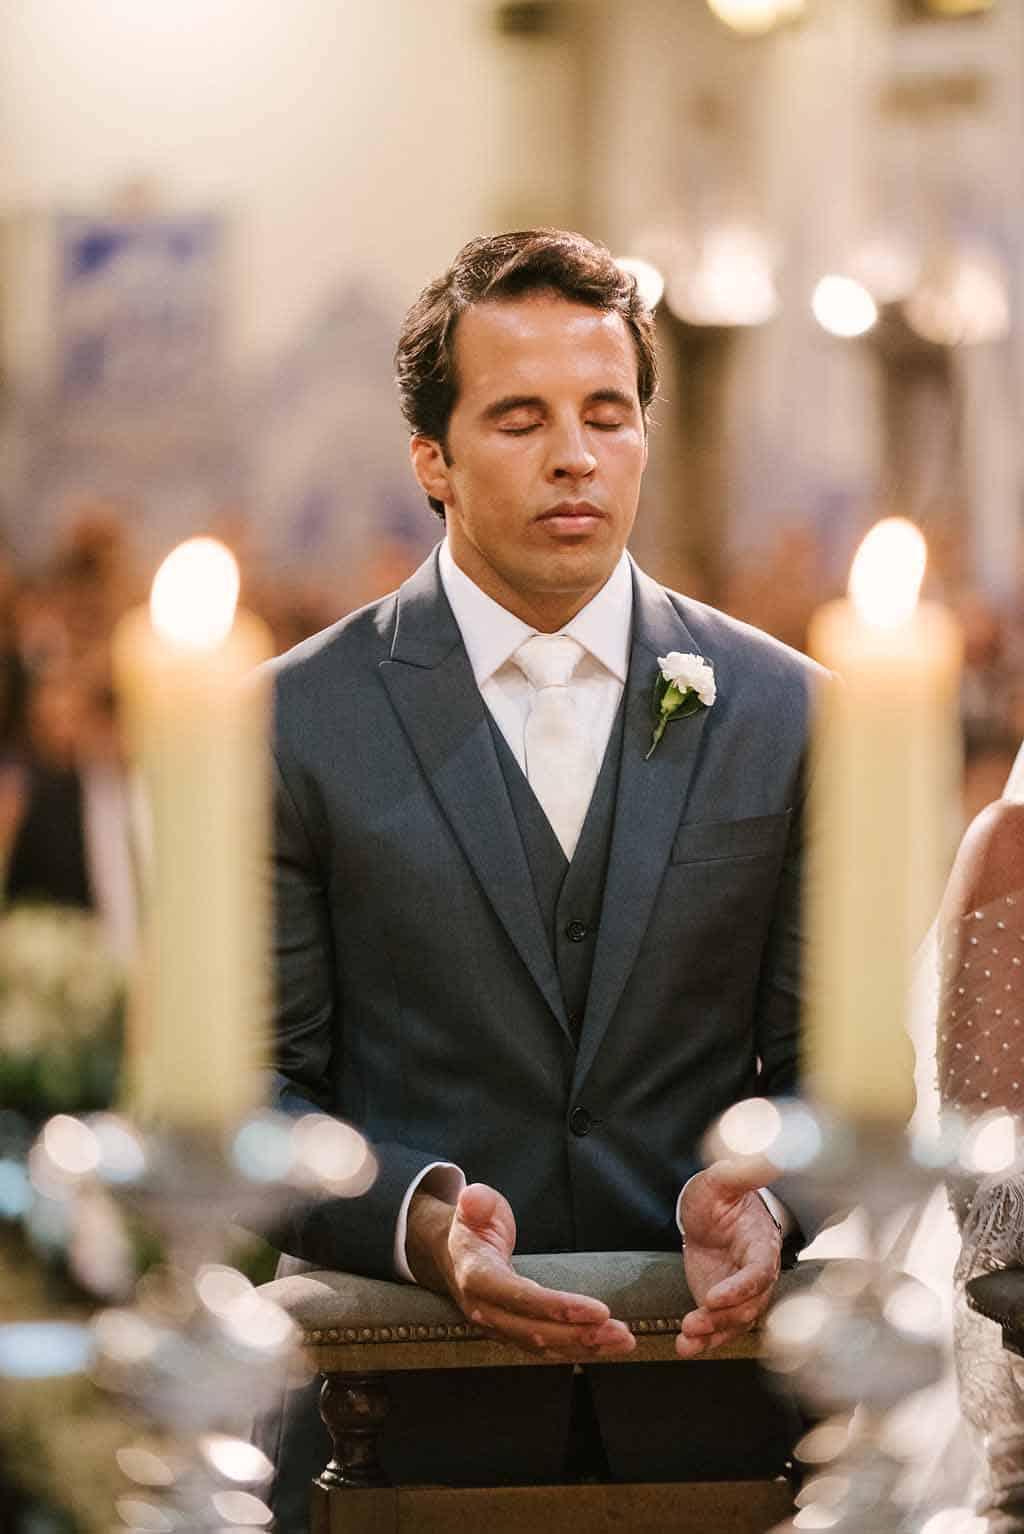 casamento-marcellaeandre-lucaslimafotografia-453